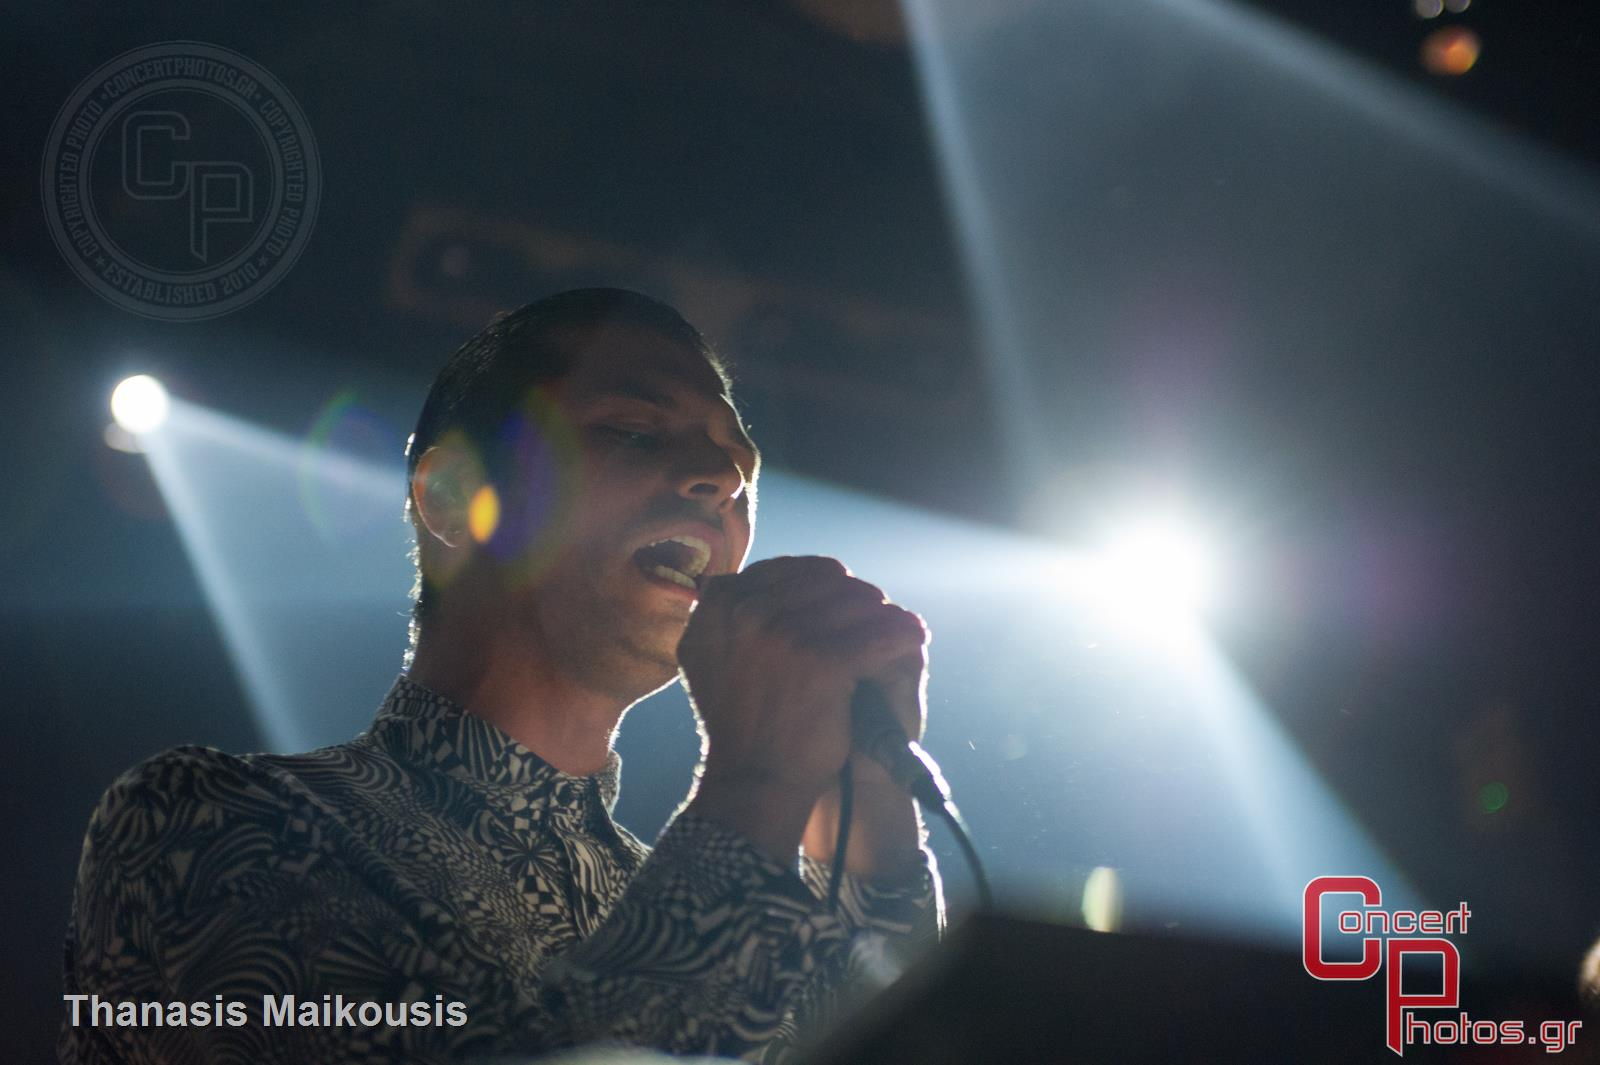 Tricky - Spectralfire-Tricky - Spectralfire photographer: Thanasis Maikousis - concertphotos_-3540